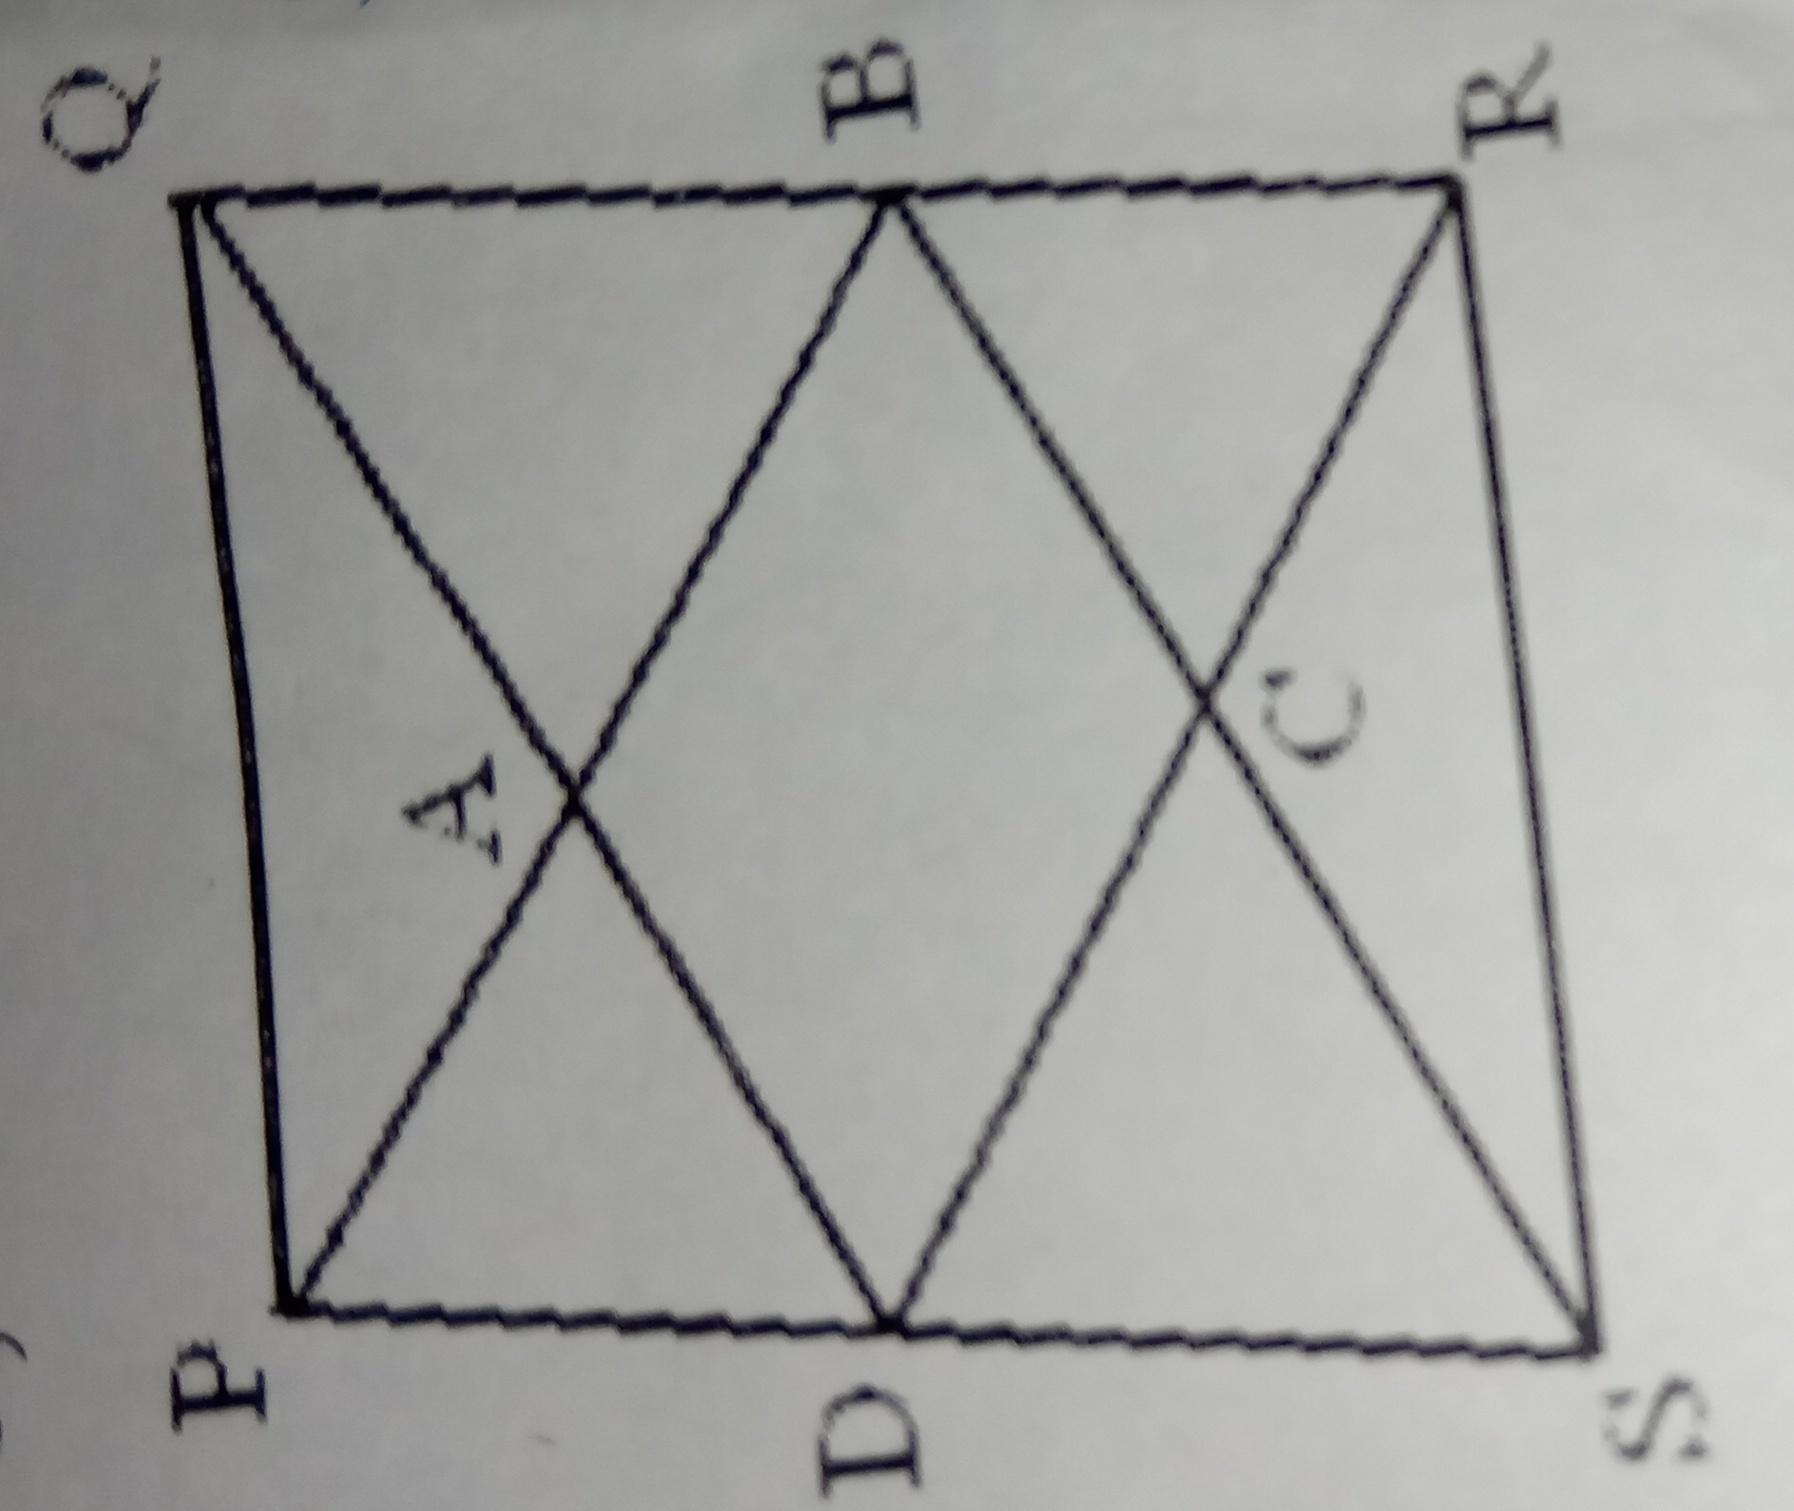 Pqrs is a convex quadrilateral prove that PQ + QR + Rs